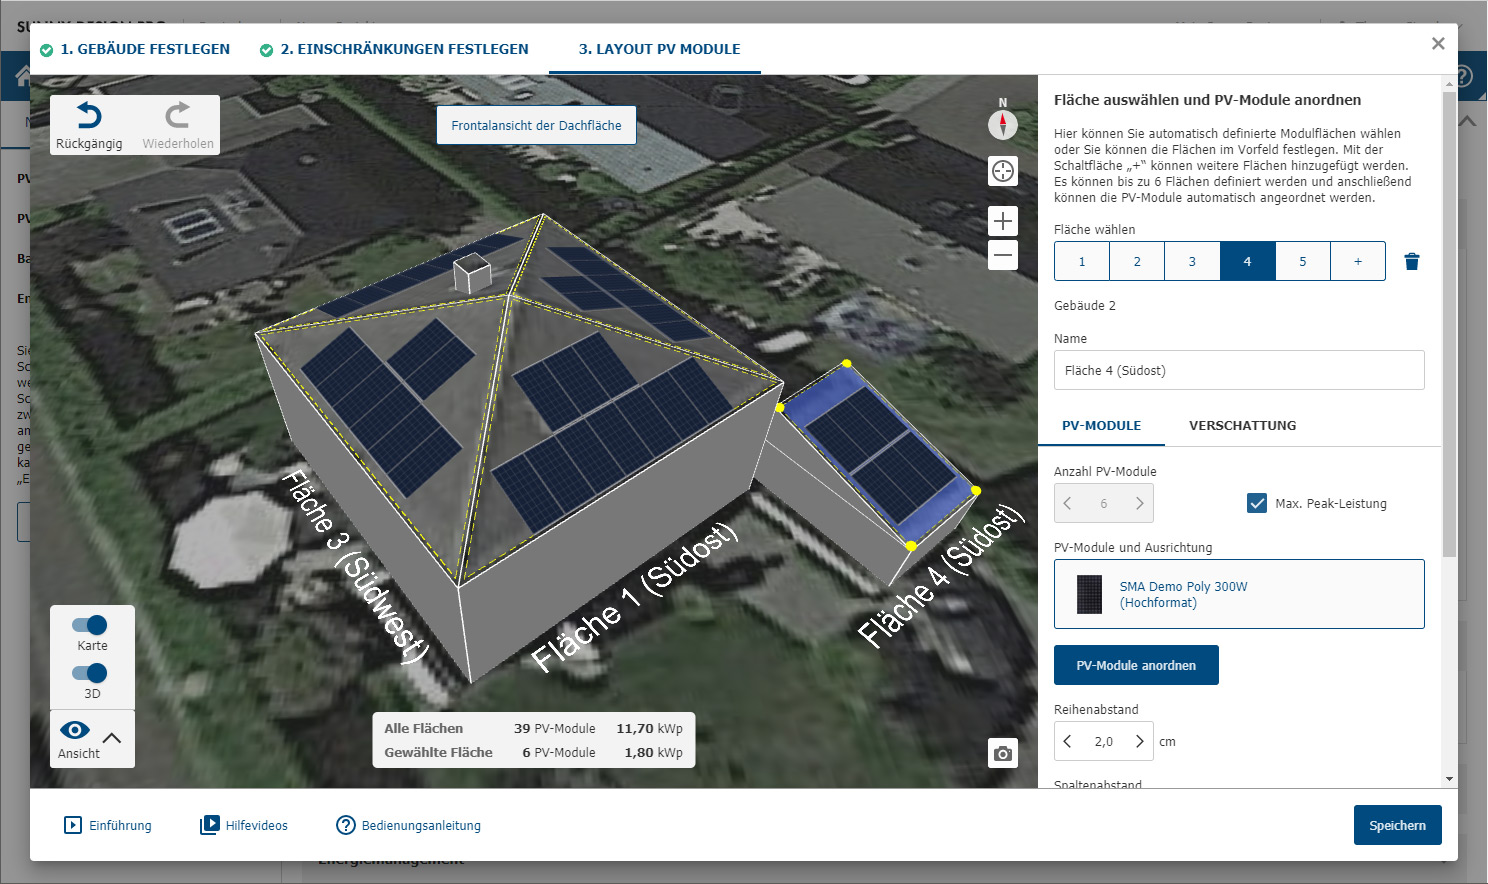 Screenshot Zeltdach mit Carport